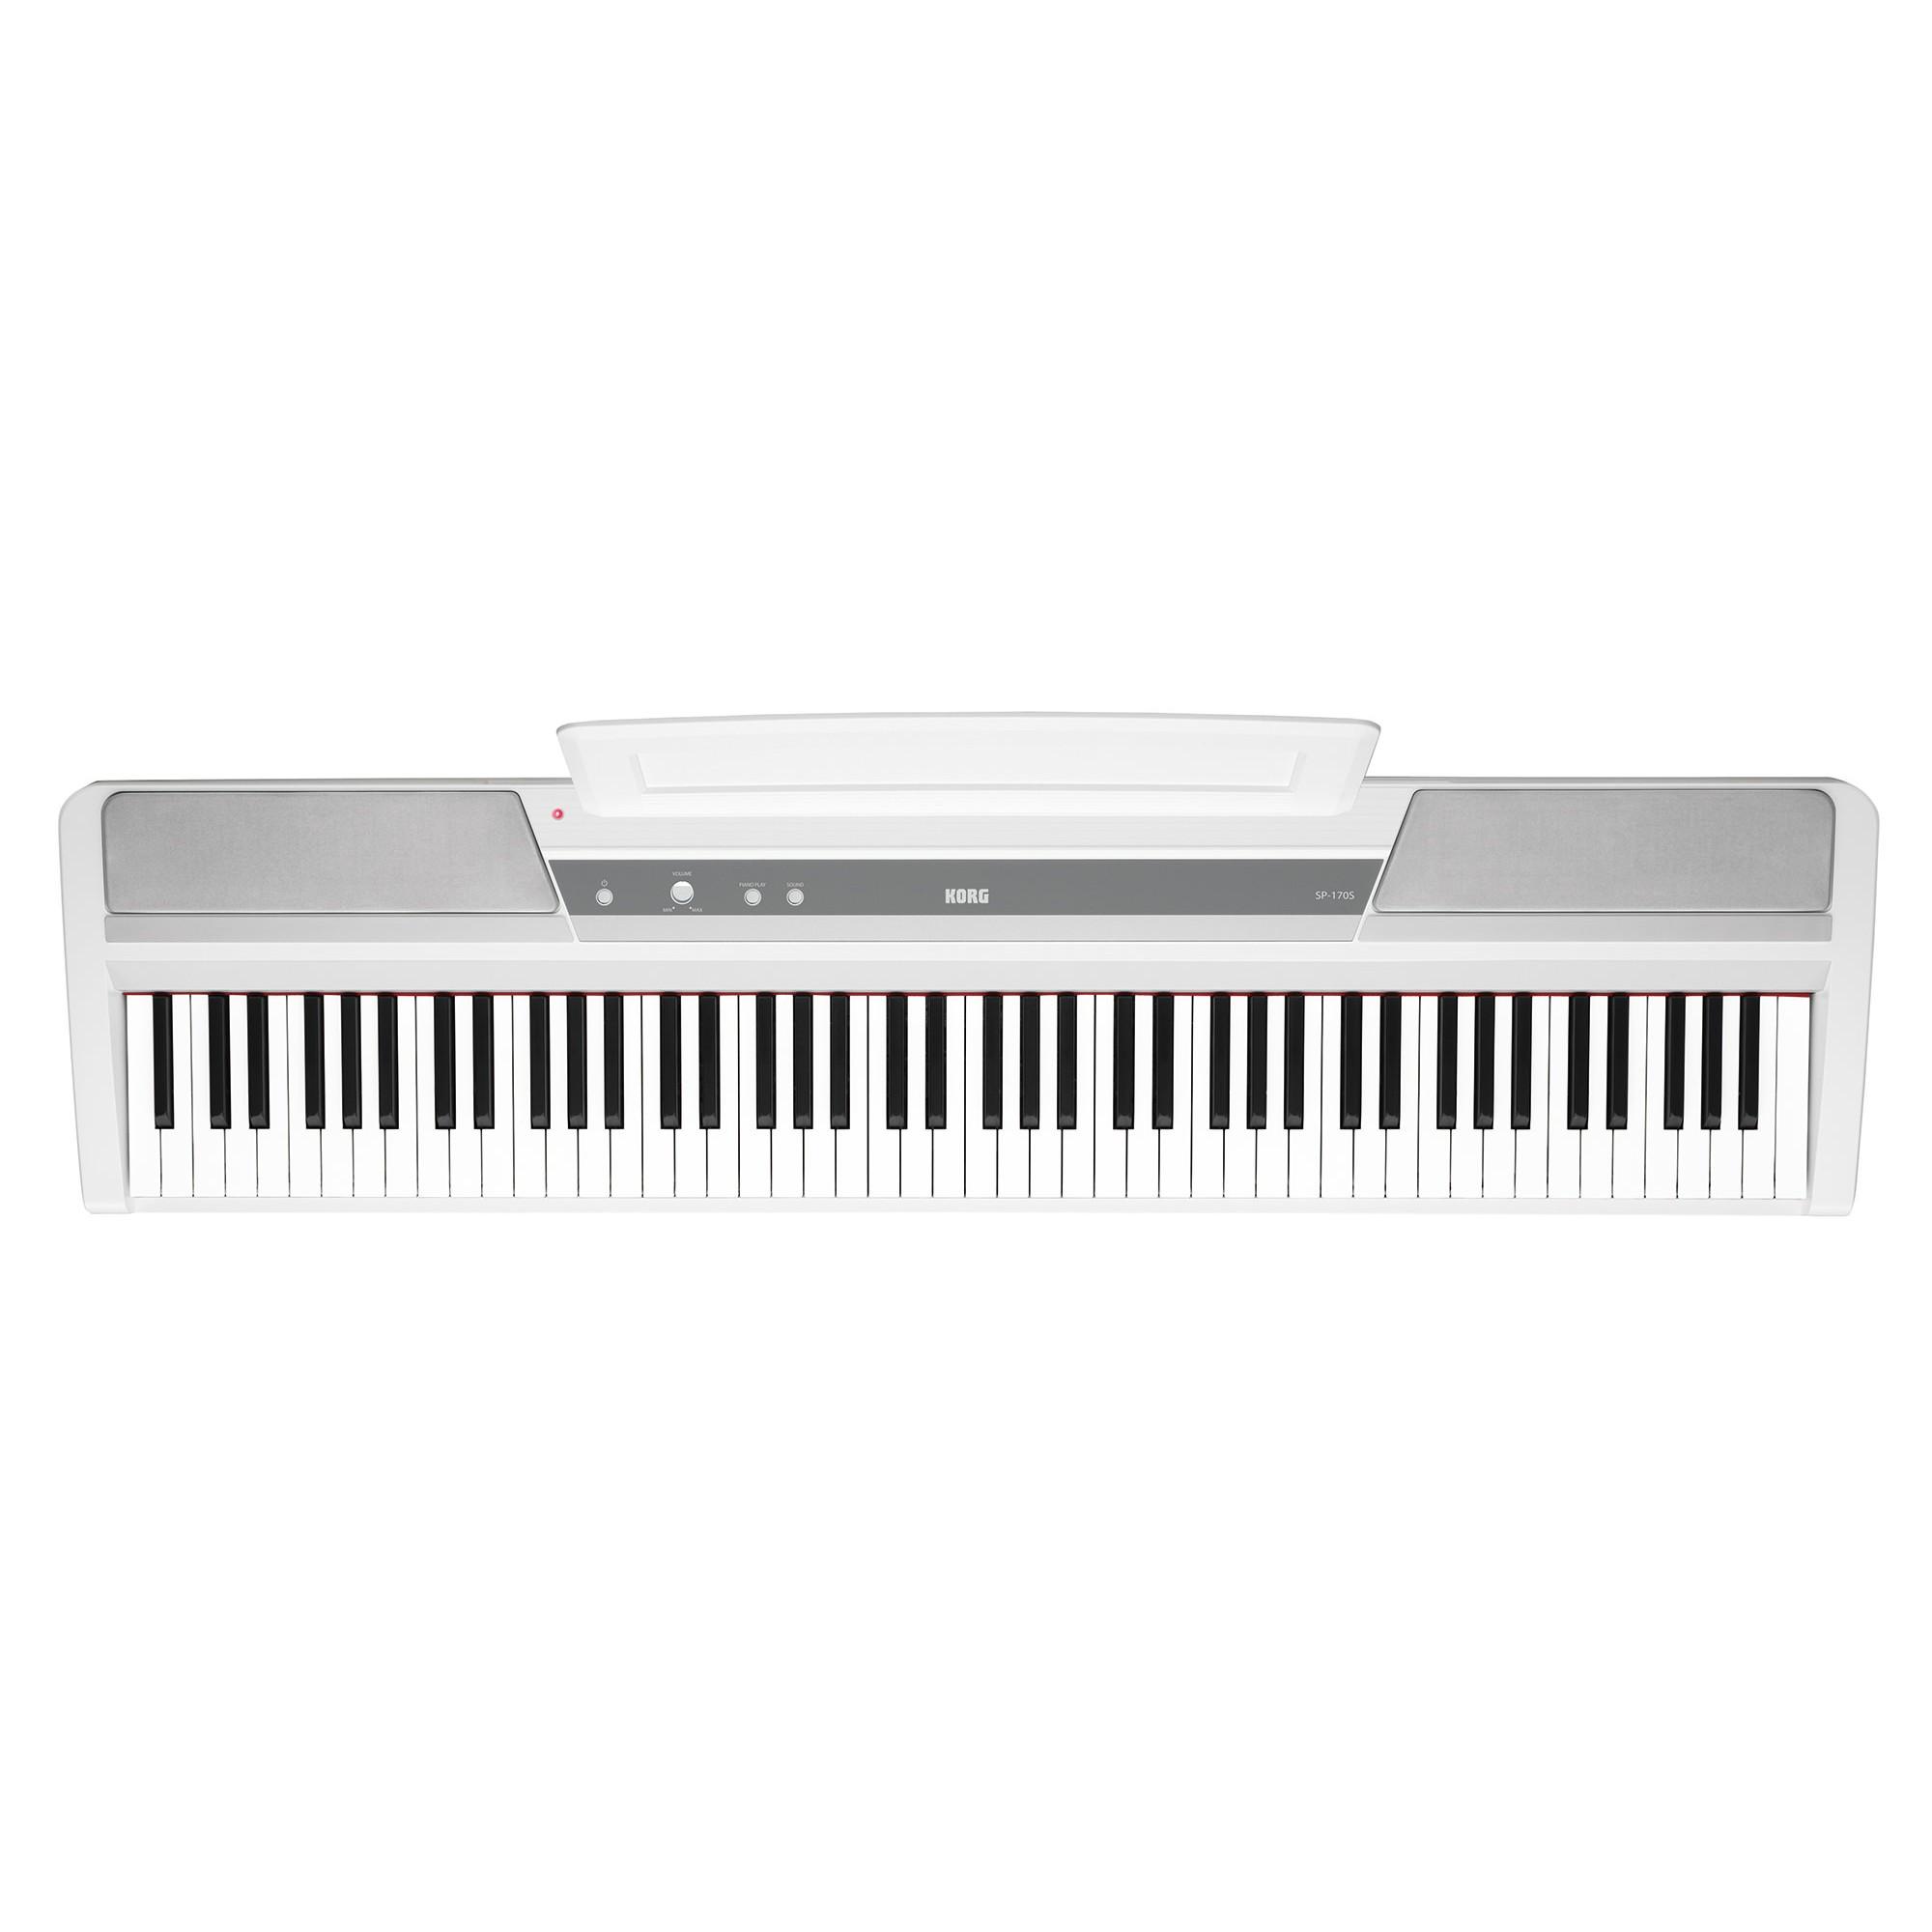 Korg SP170s 88 | Buy Digital Piano | Best Price